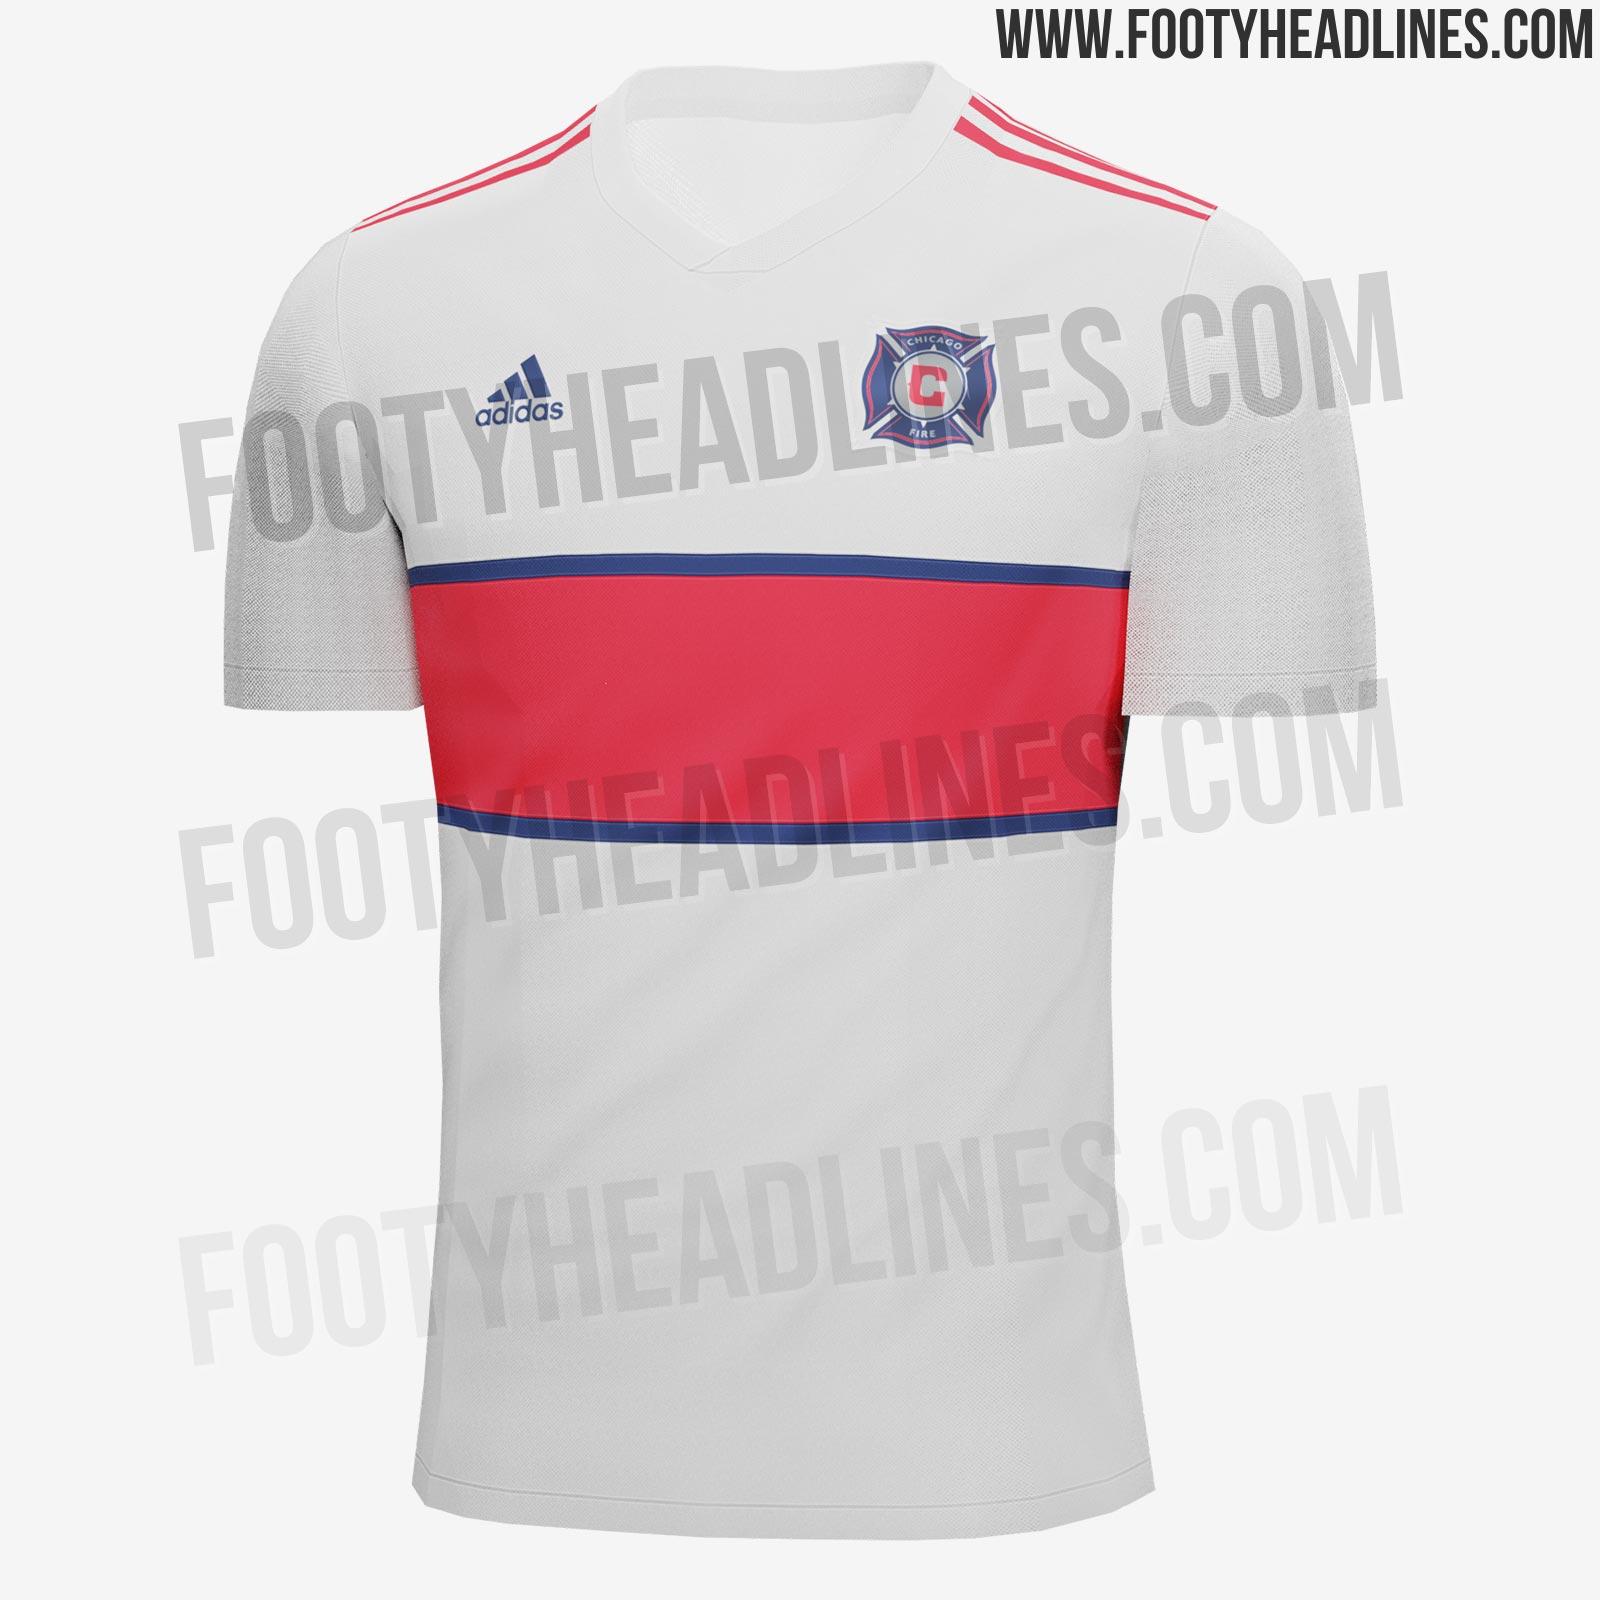 a7b3262e8be 2019 Secondary Shirt